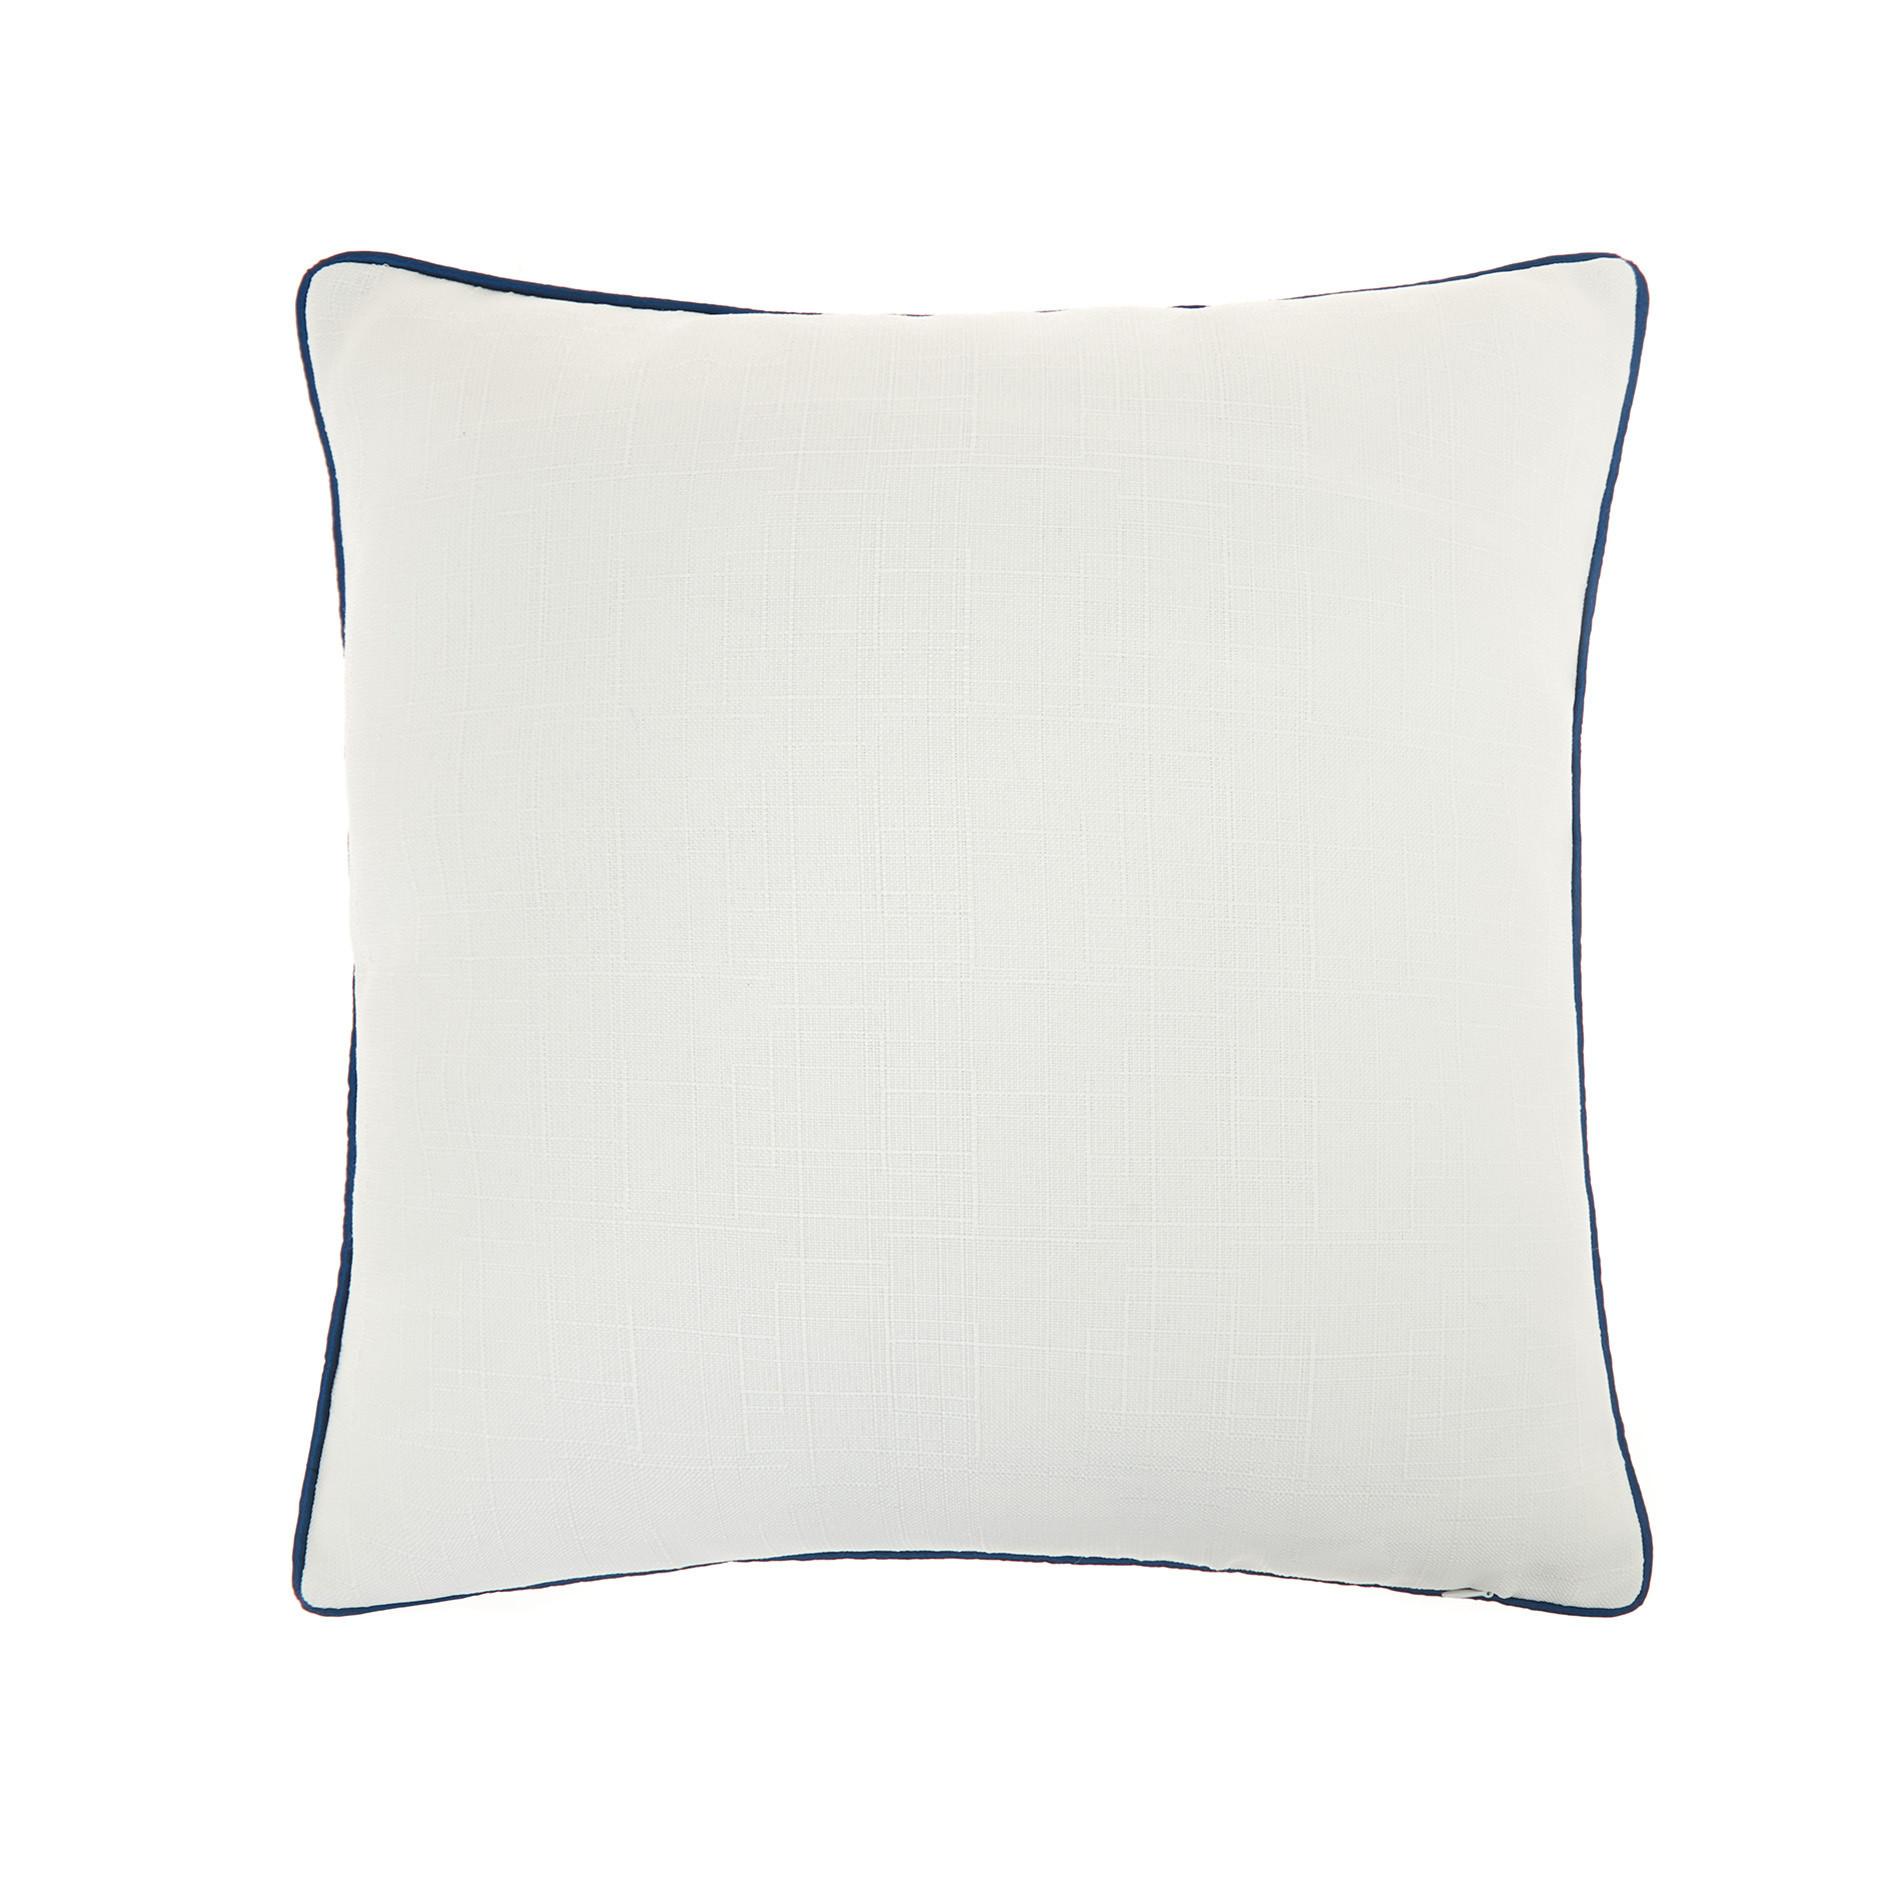 Cuscino ricamo polpo 45x45cm, Blu, large image number 1